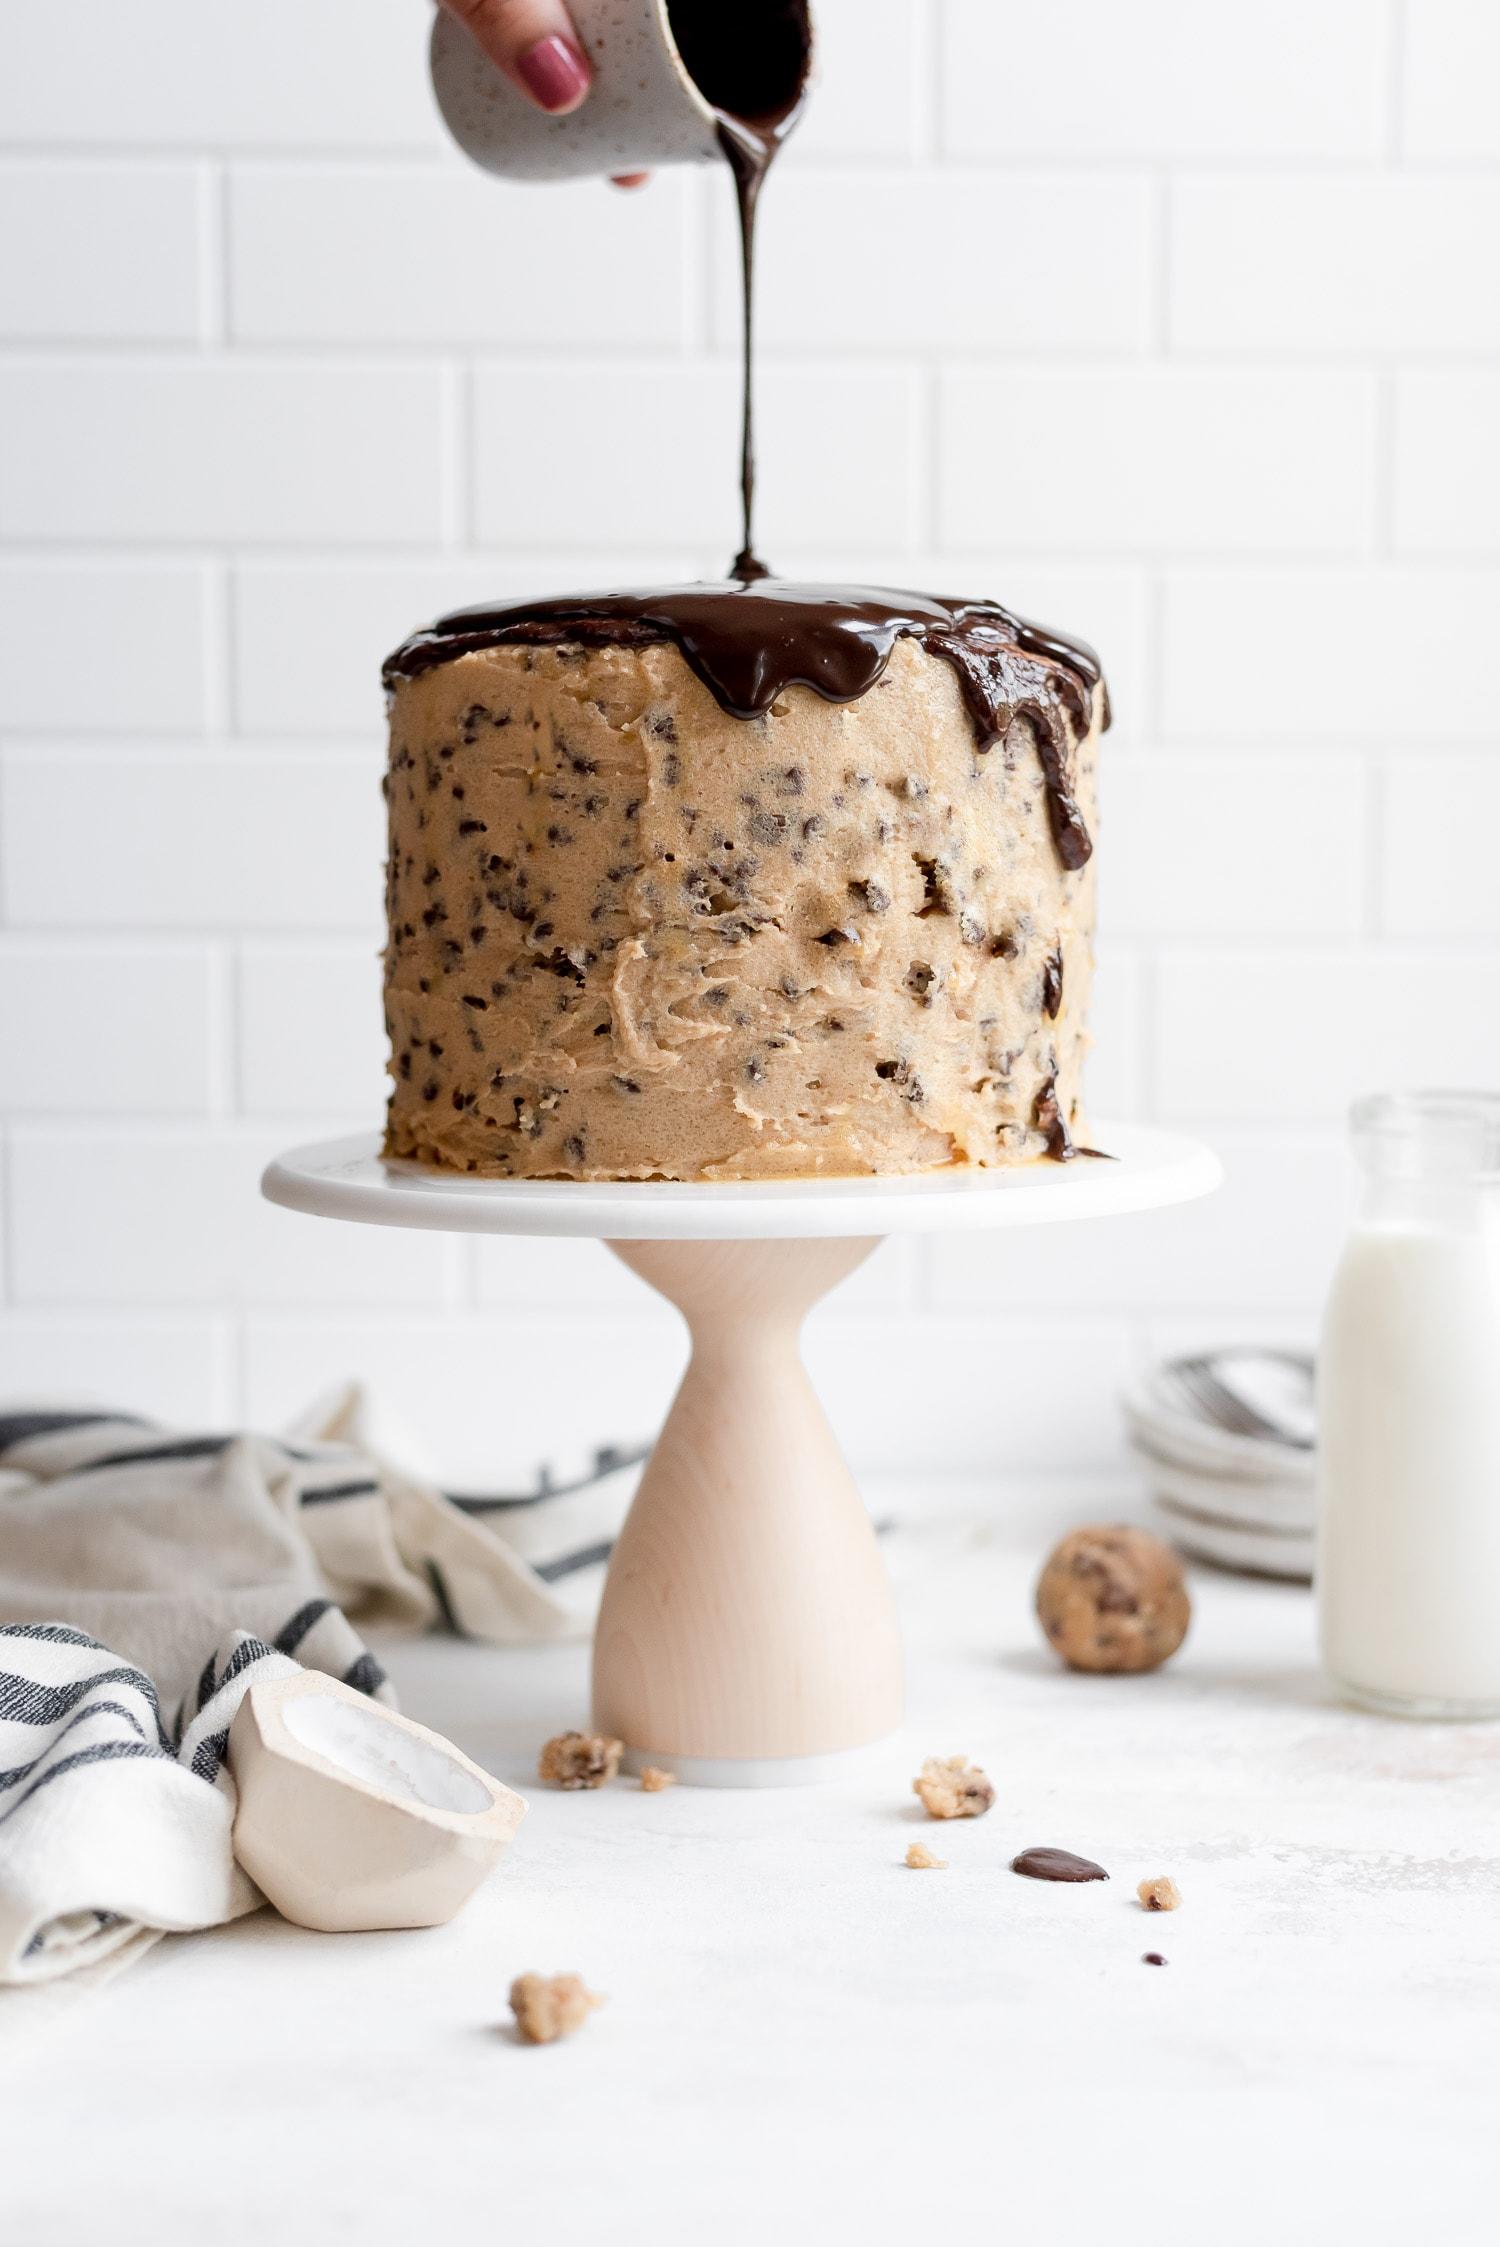 ganache being poured on cake